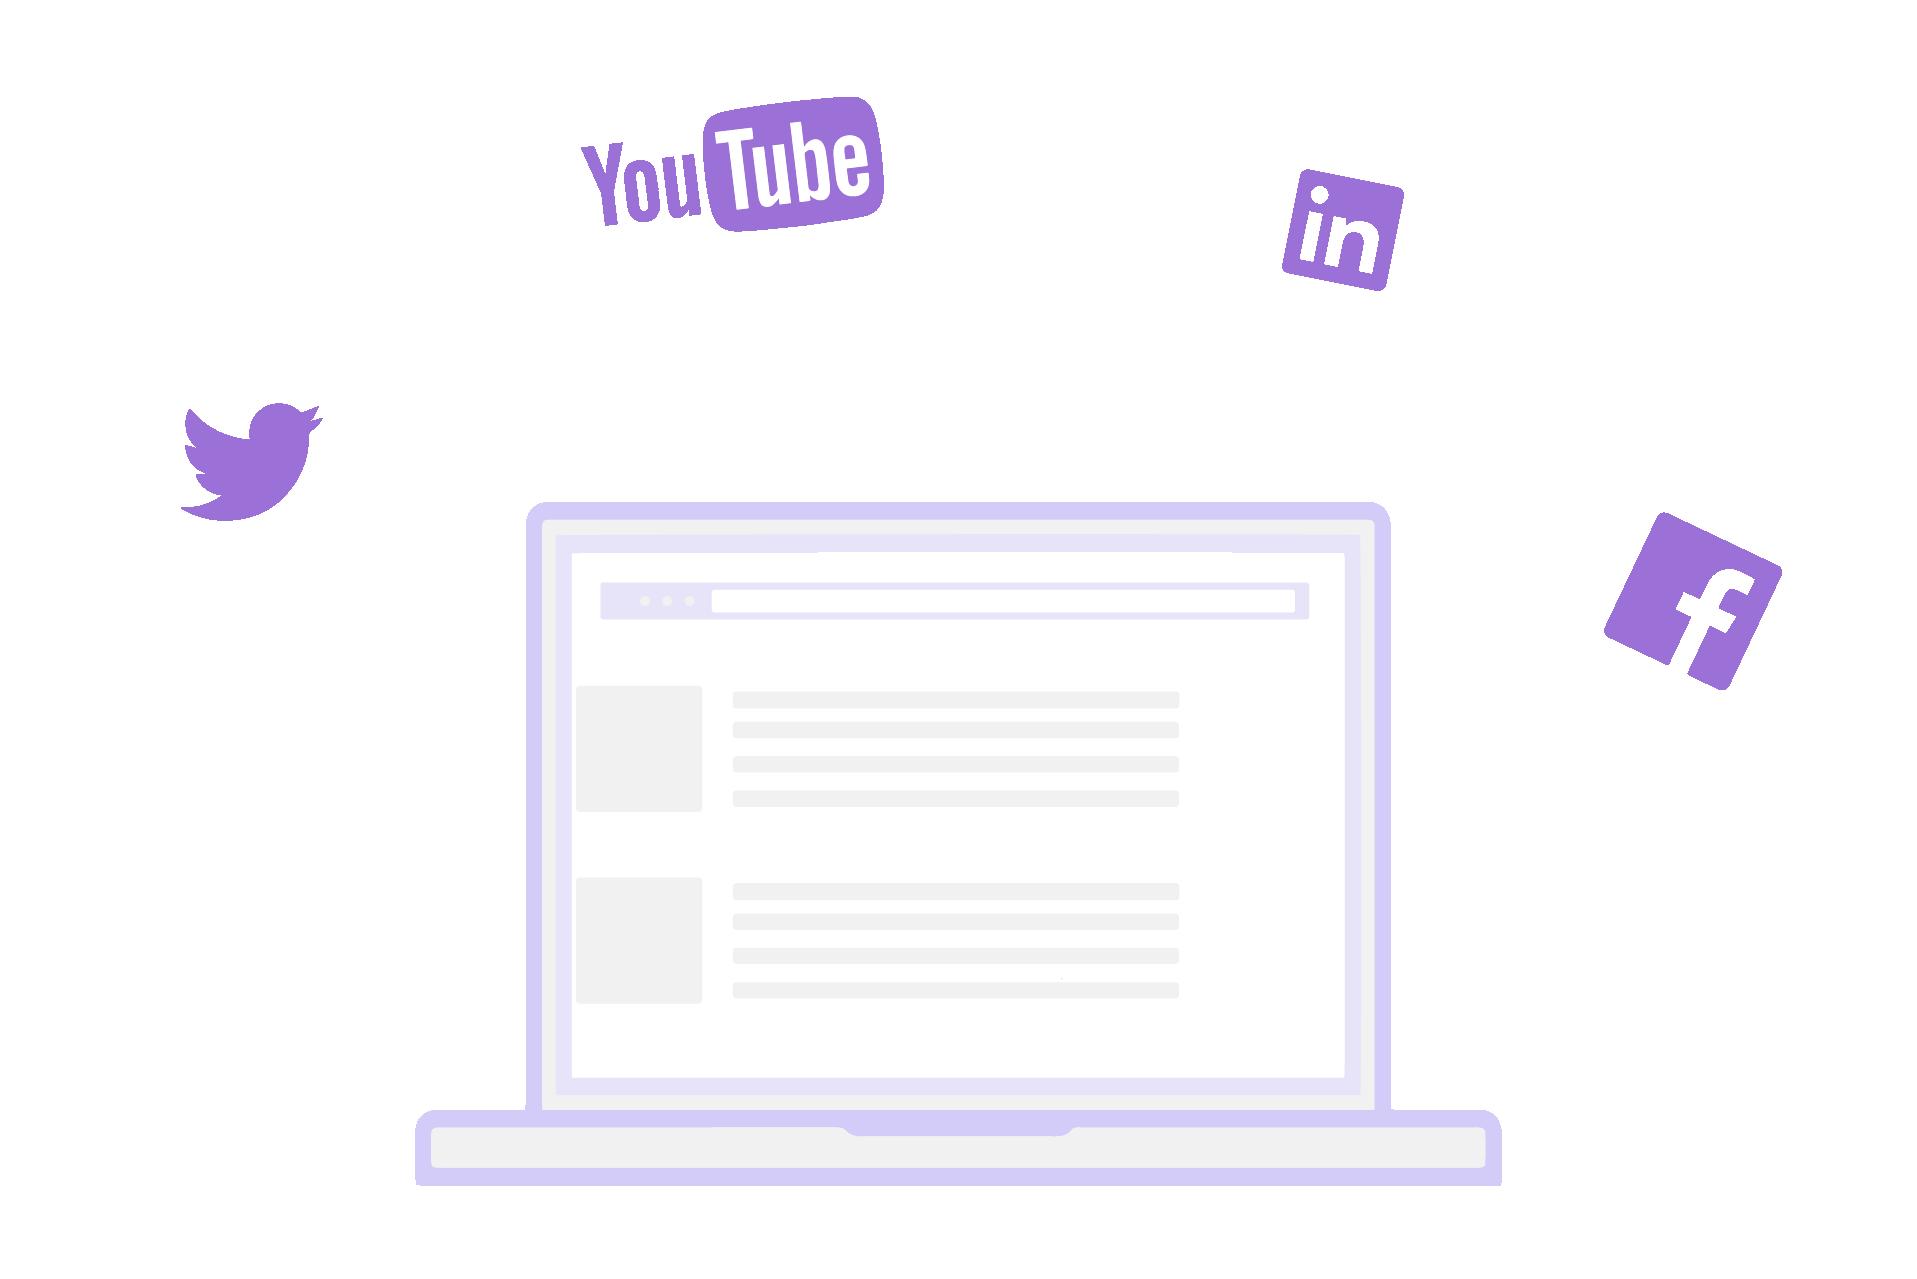 social-media-customer-experience-getjenny-report-03